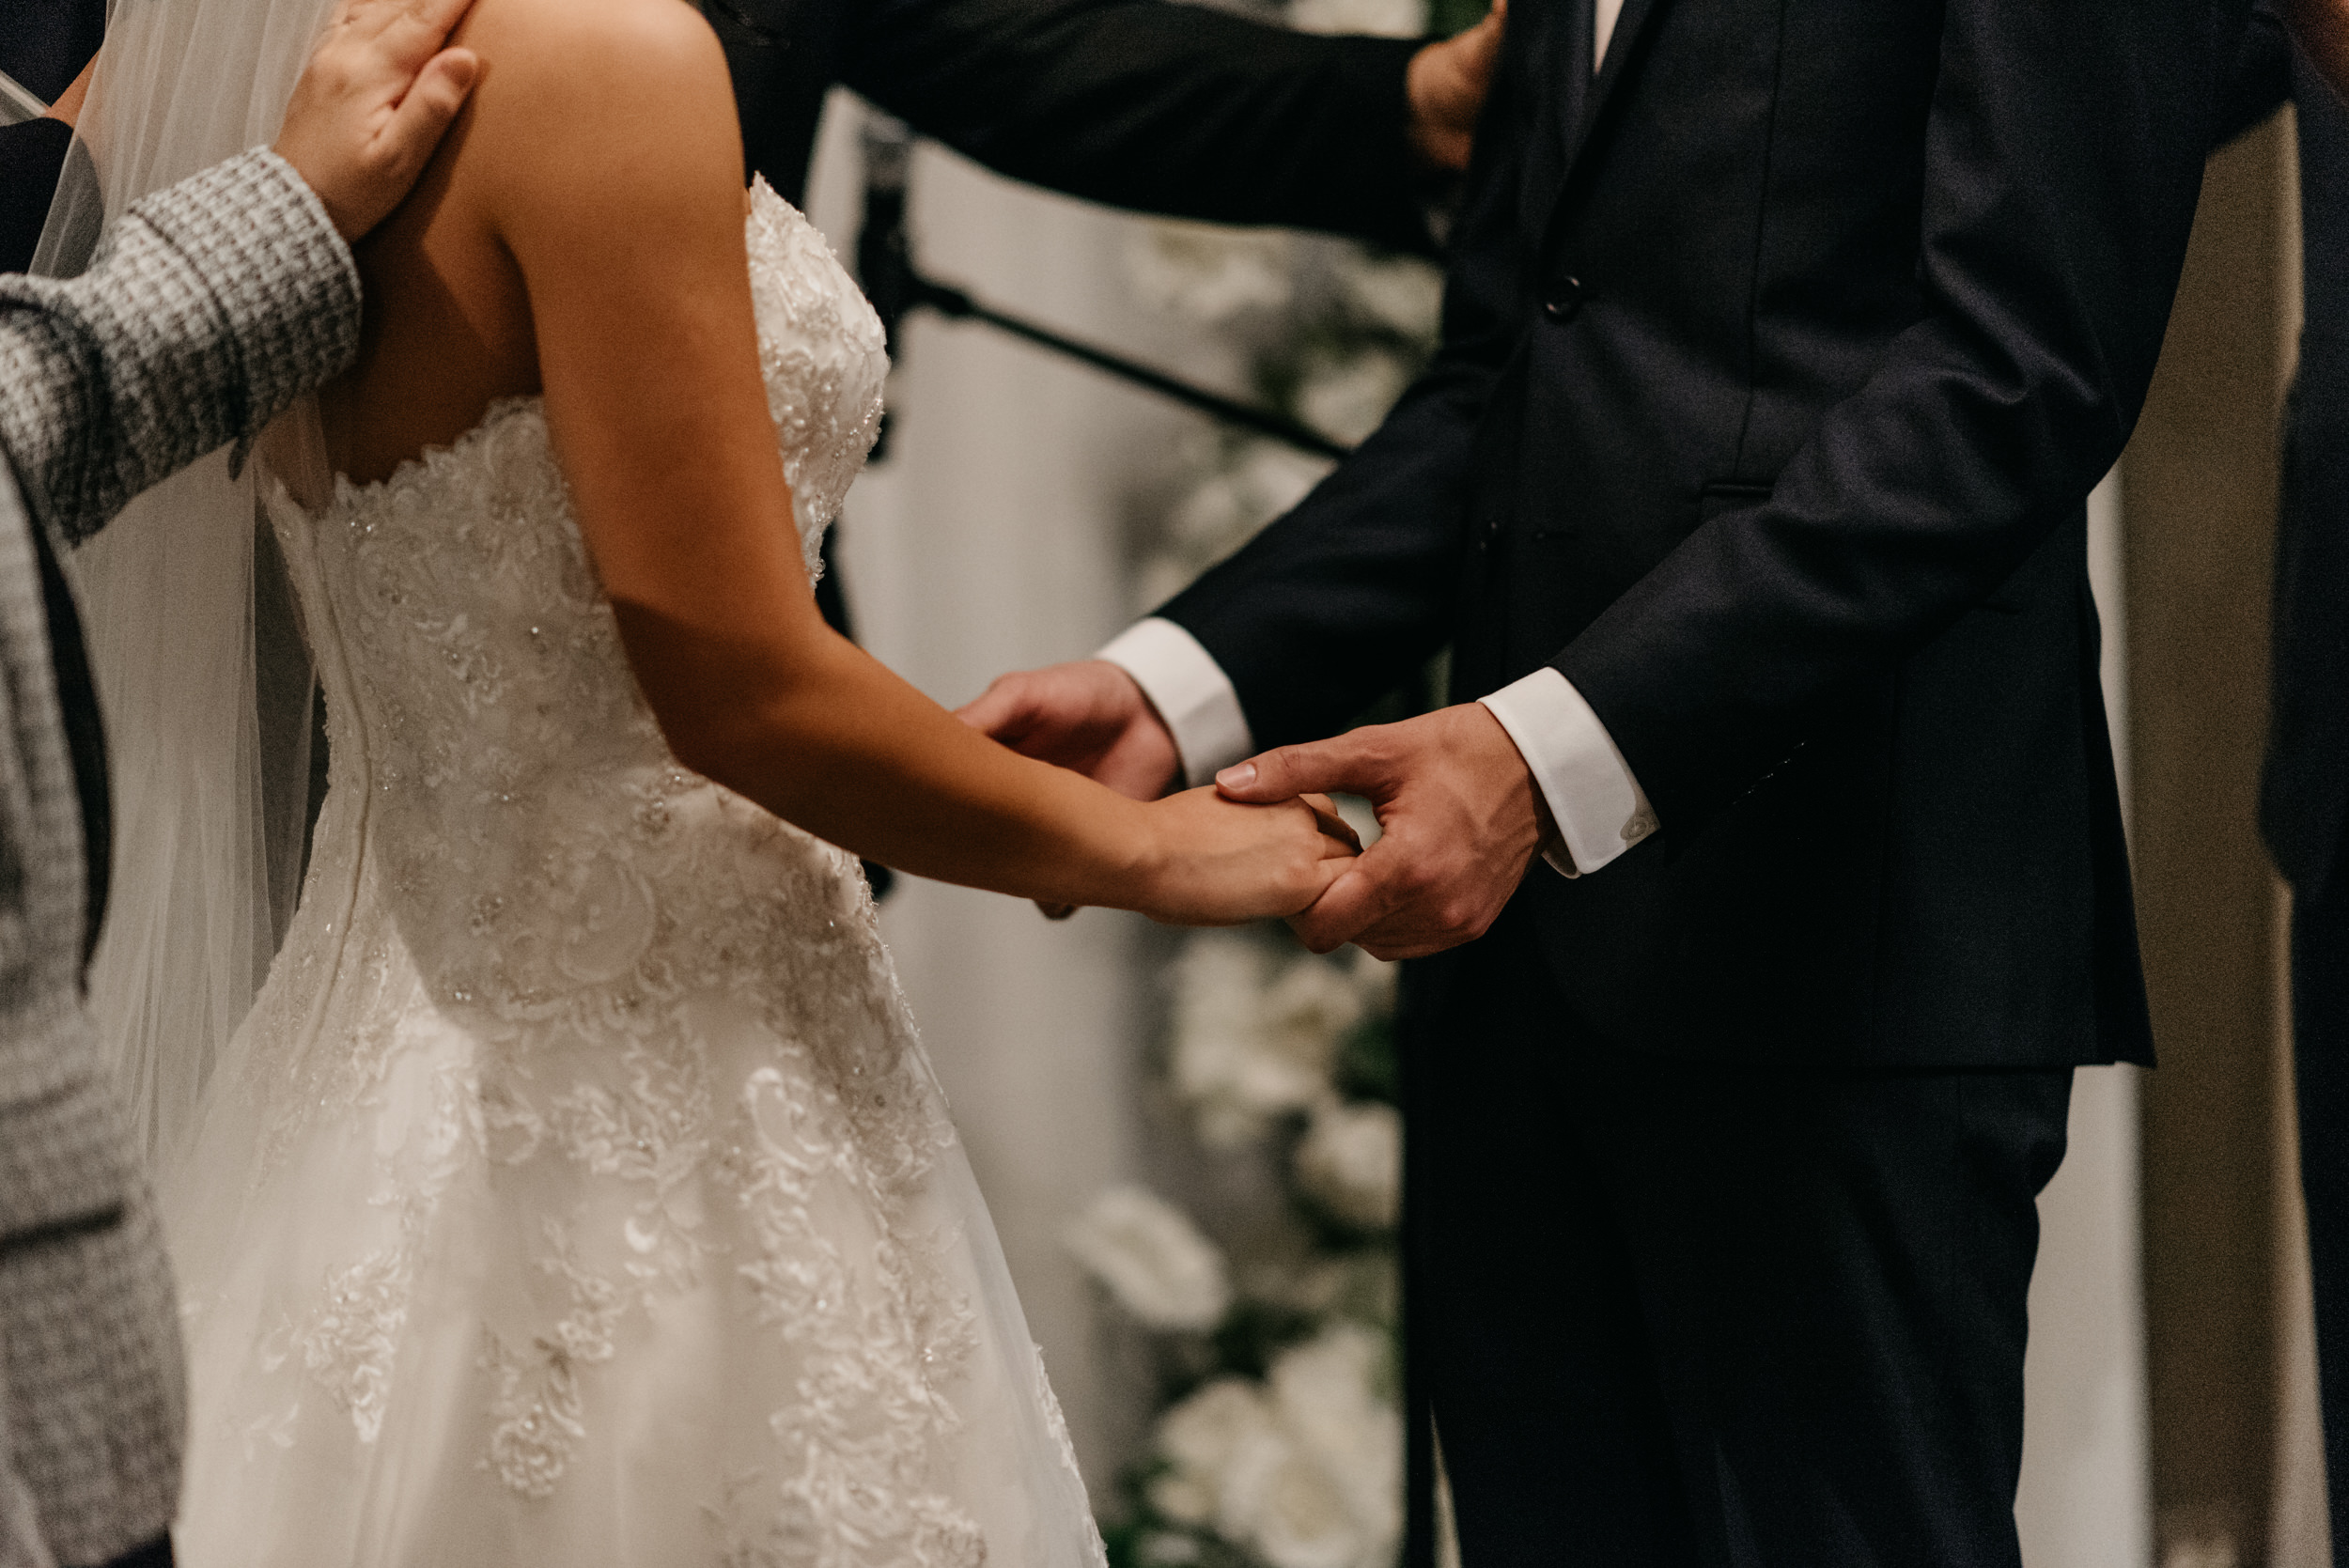 86-ceremony-west-end-ballroom-portland-wedding-venue-9208.jpg